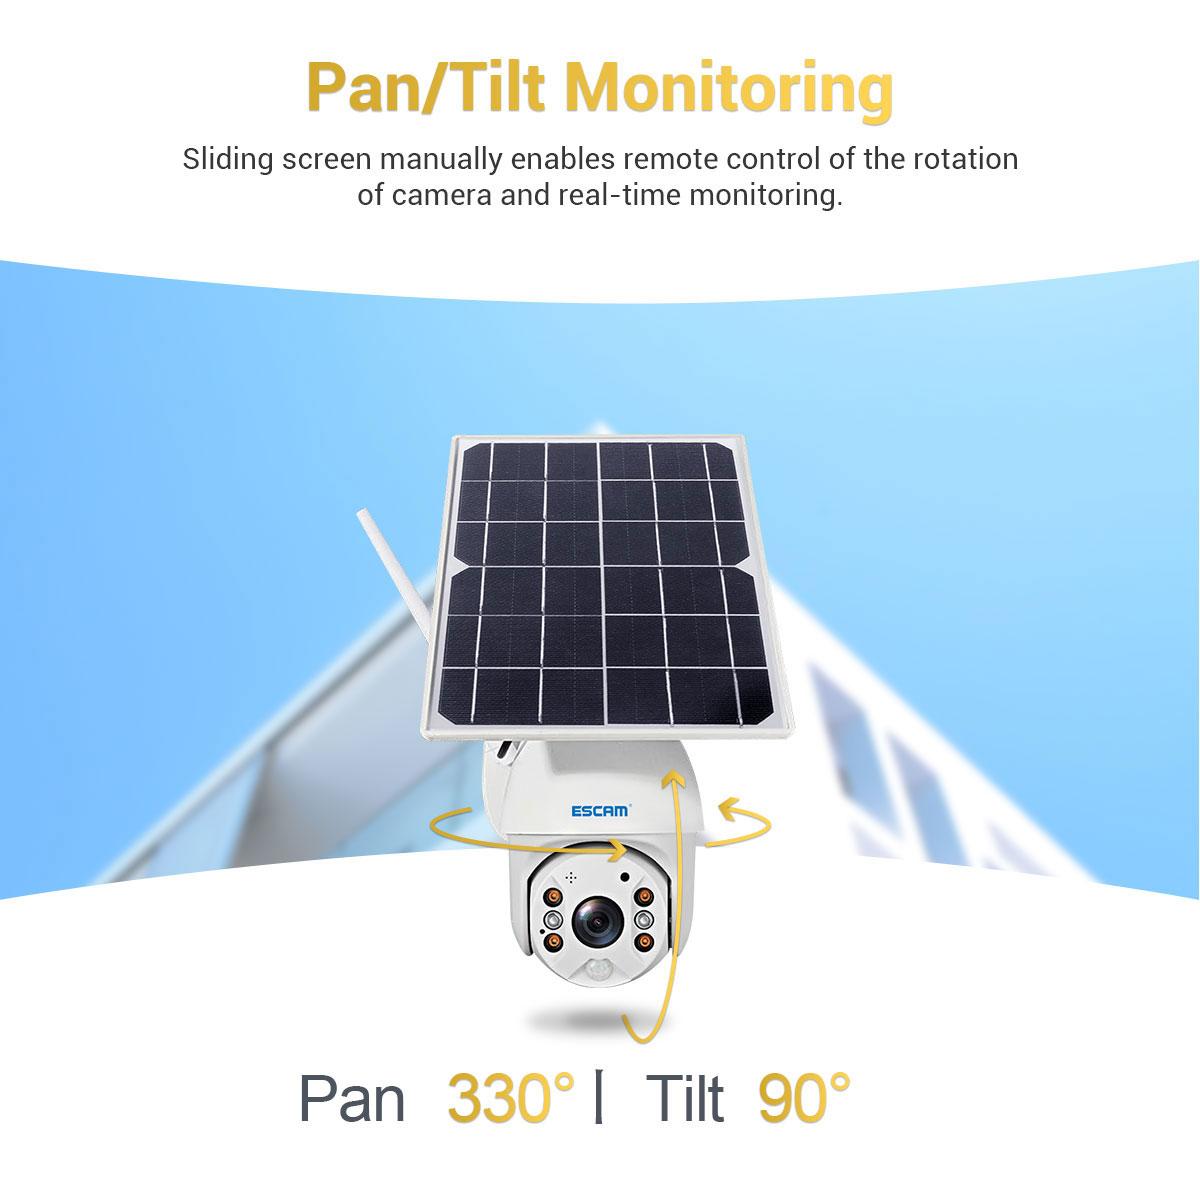 ESCAM QF280 pan monitoring